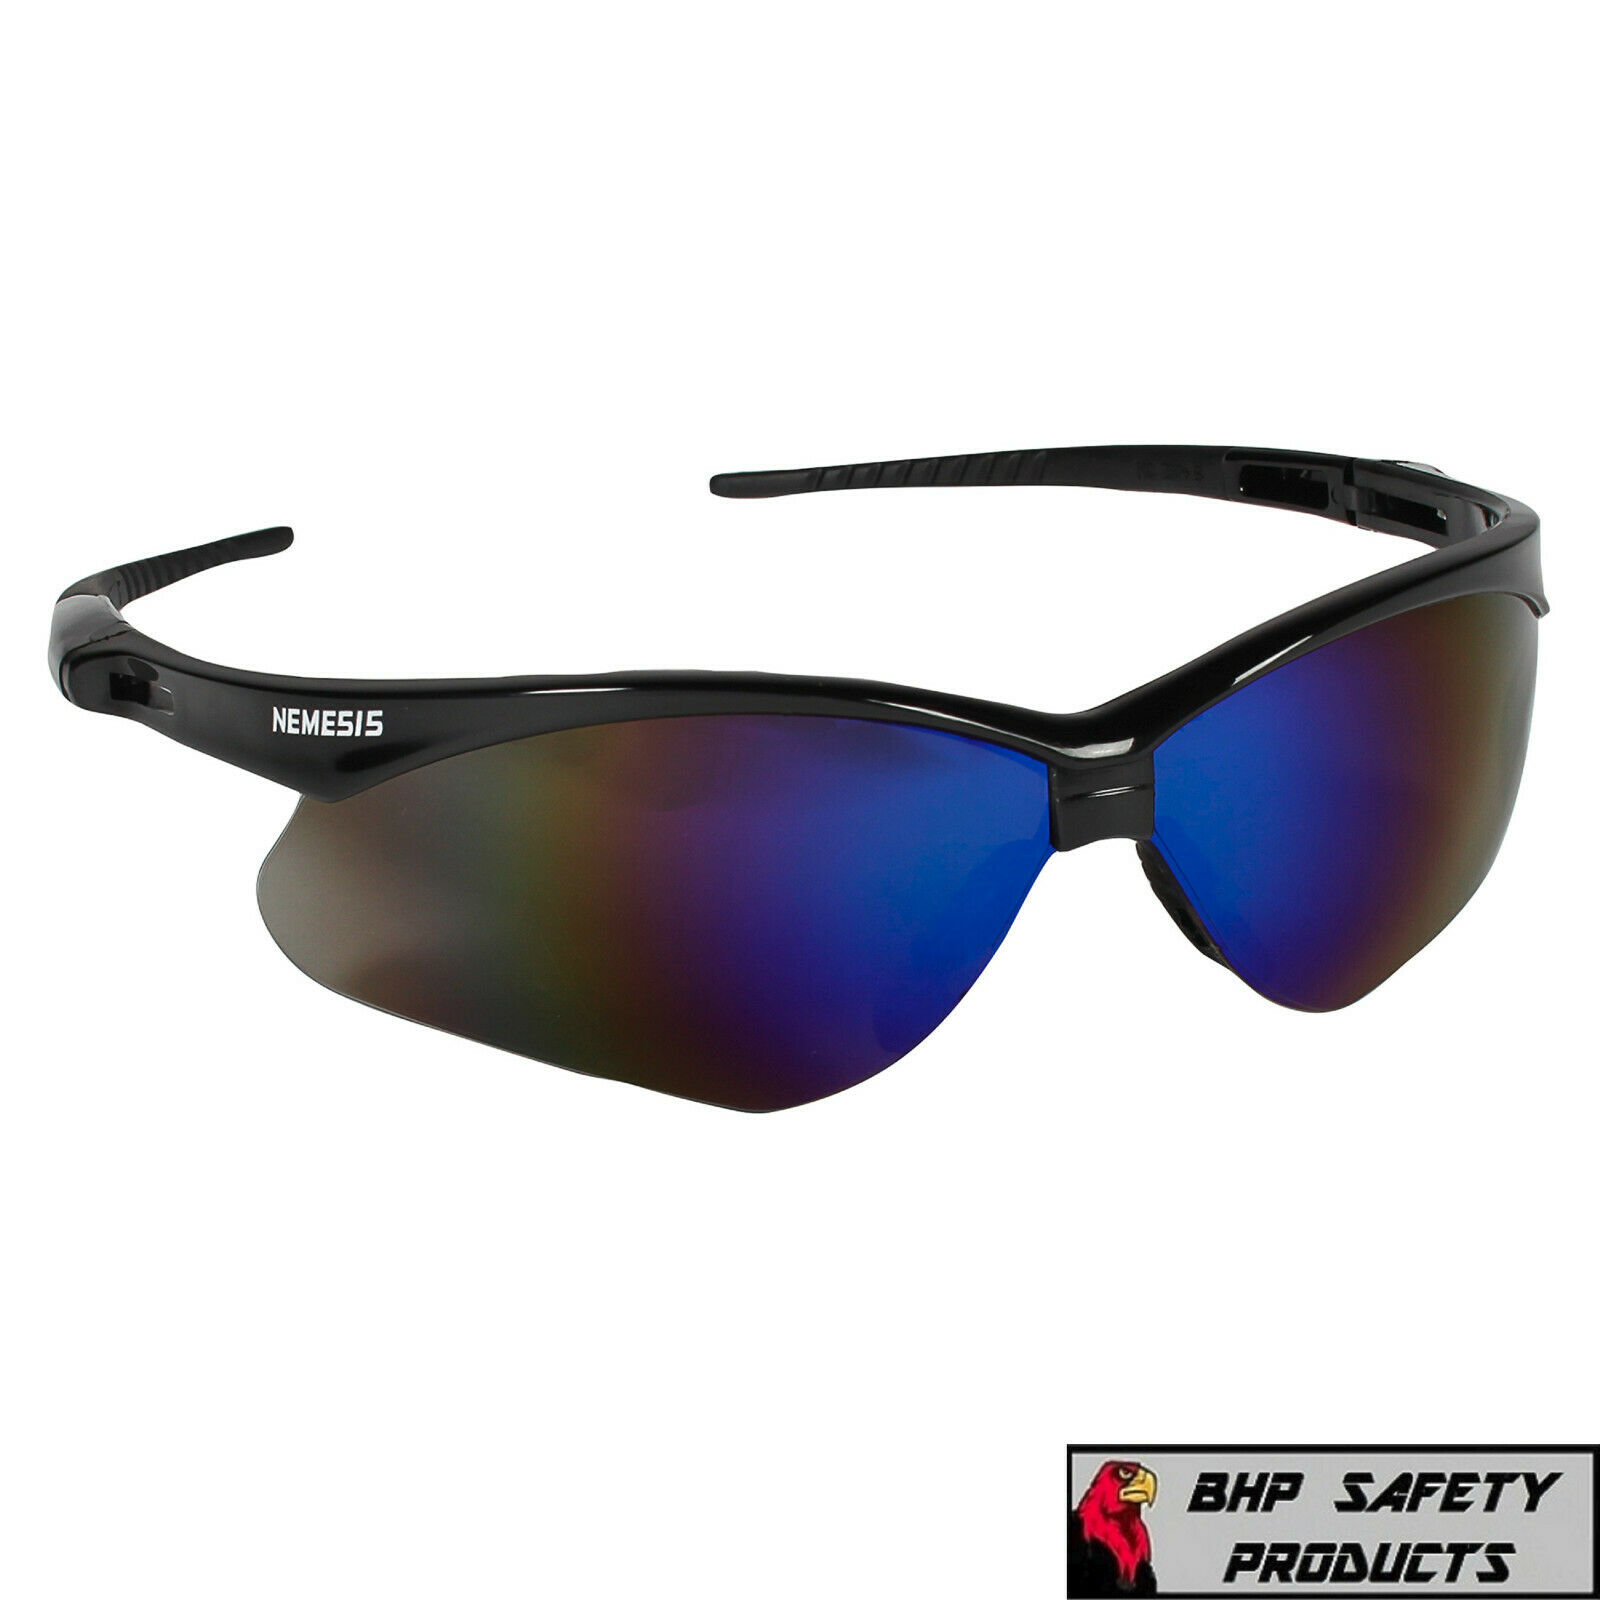 JACKSON NEMESIS SAFETY GLASSES SUNGLASSES SPORT WORK EYEWEAR ANSI Z87 COMPLIANT 14481- Black Frame/Blue Mirror Lens